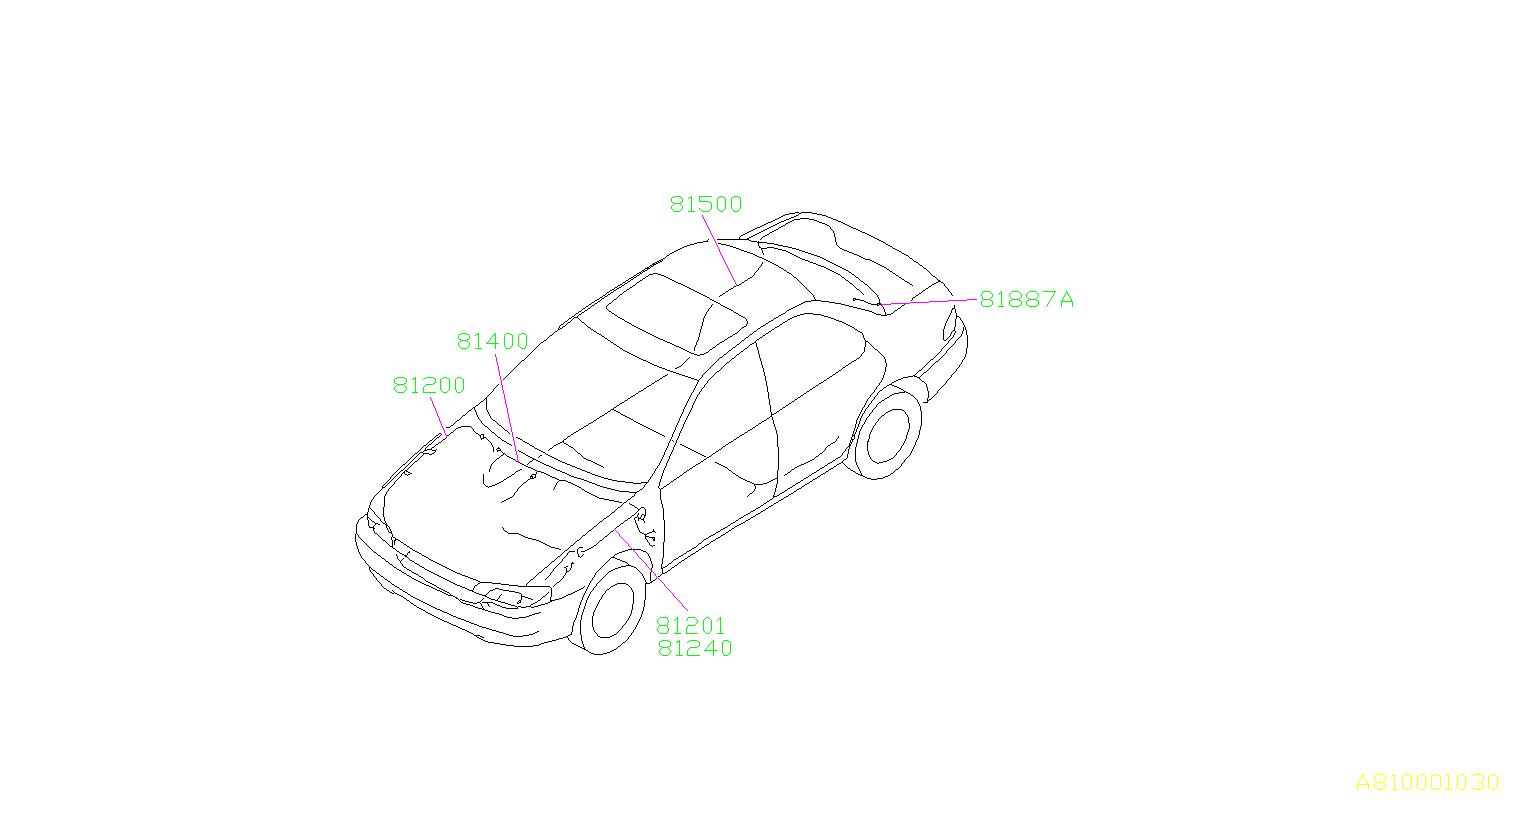 Subaru Impreza Harness Front Main Wiring Electrical